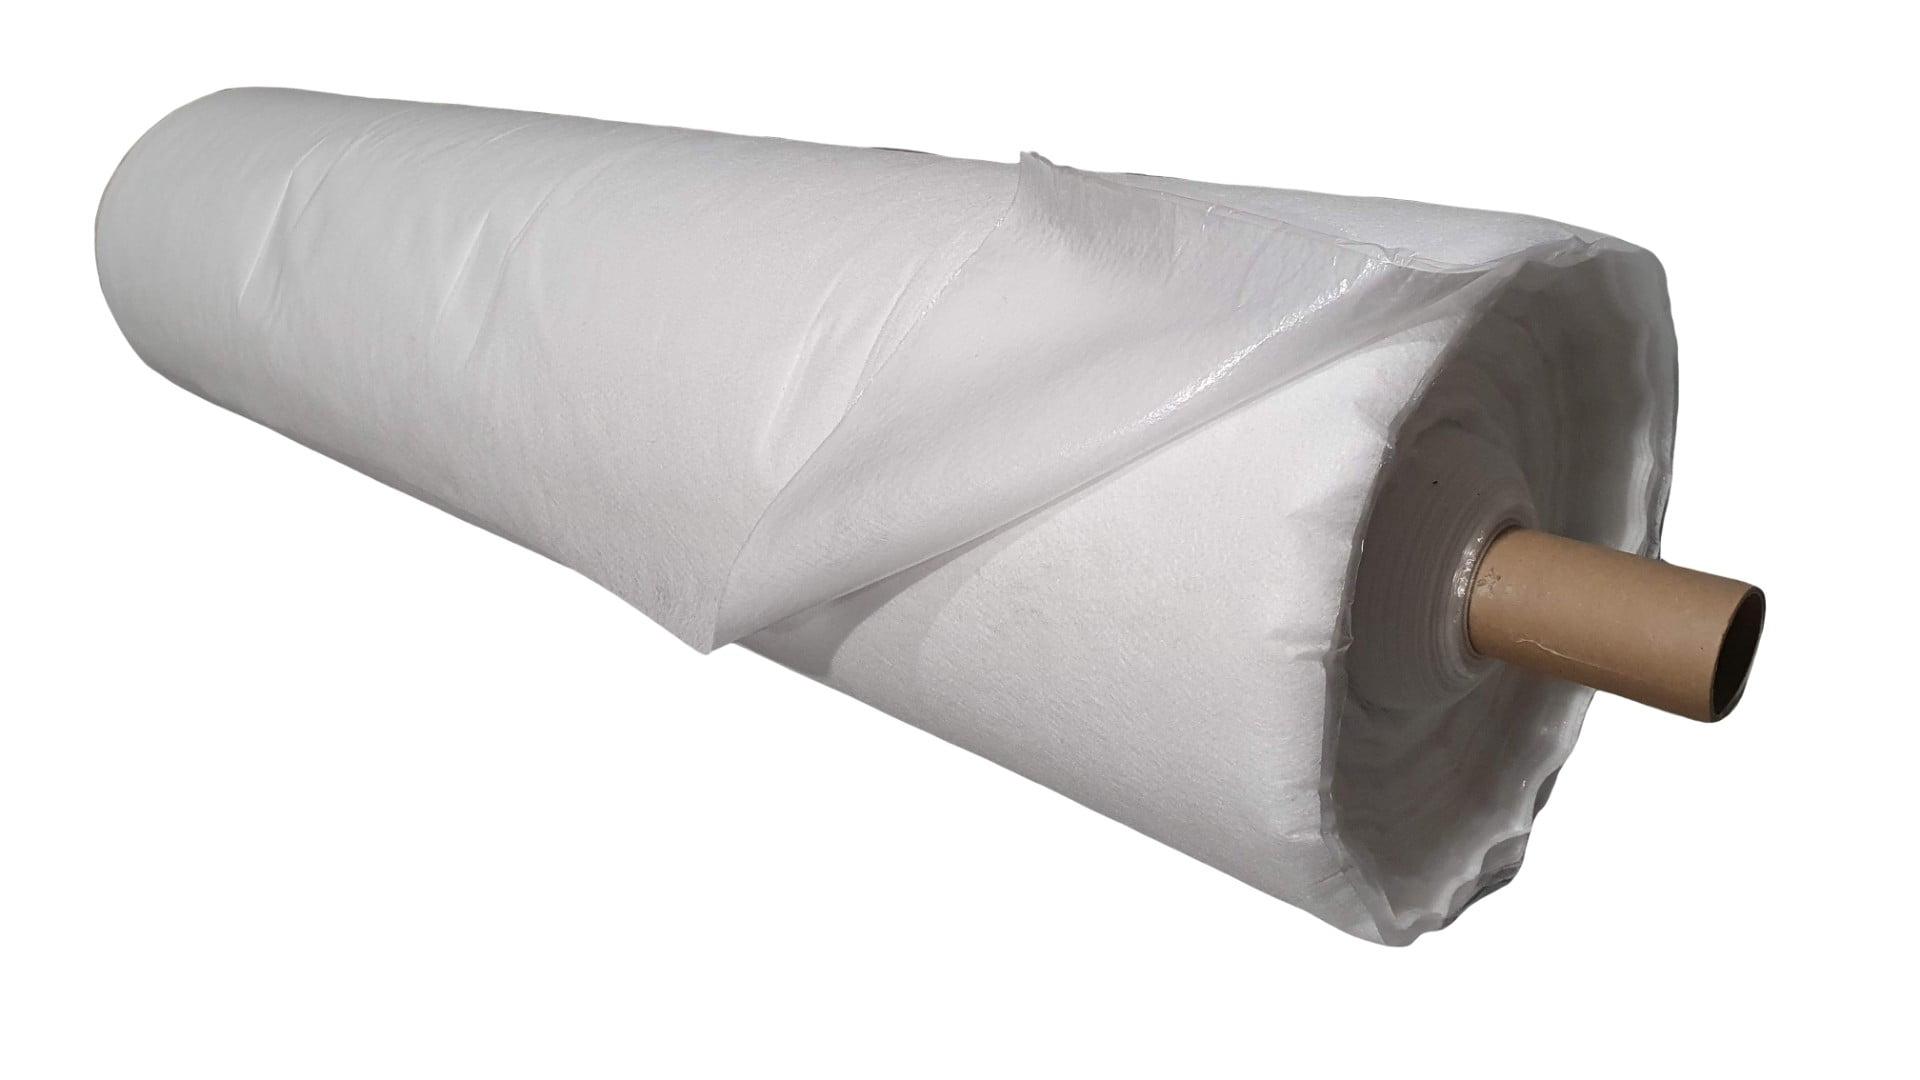 Geosin impermeabil, material laminat netesut polipropilena pentru articole medicale poza somnart.ro